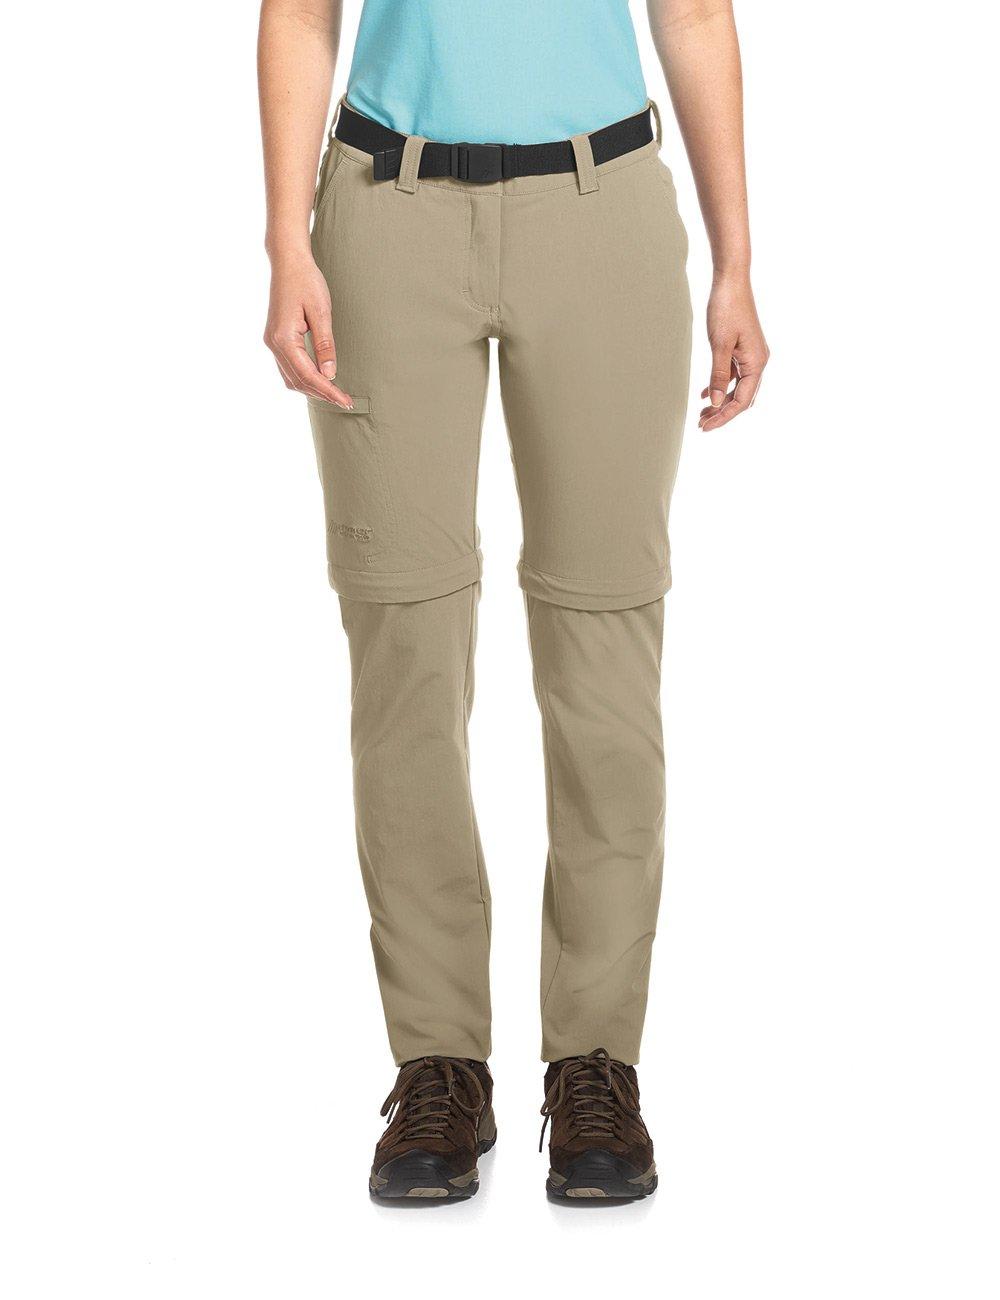 Coriander  Maier Sports Packaway 2L – Femme Inara Fin de Bermuda Pantalon de randonnée à Fermeture éclair, femmes, Inara